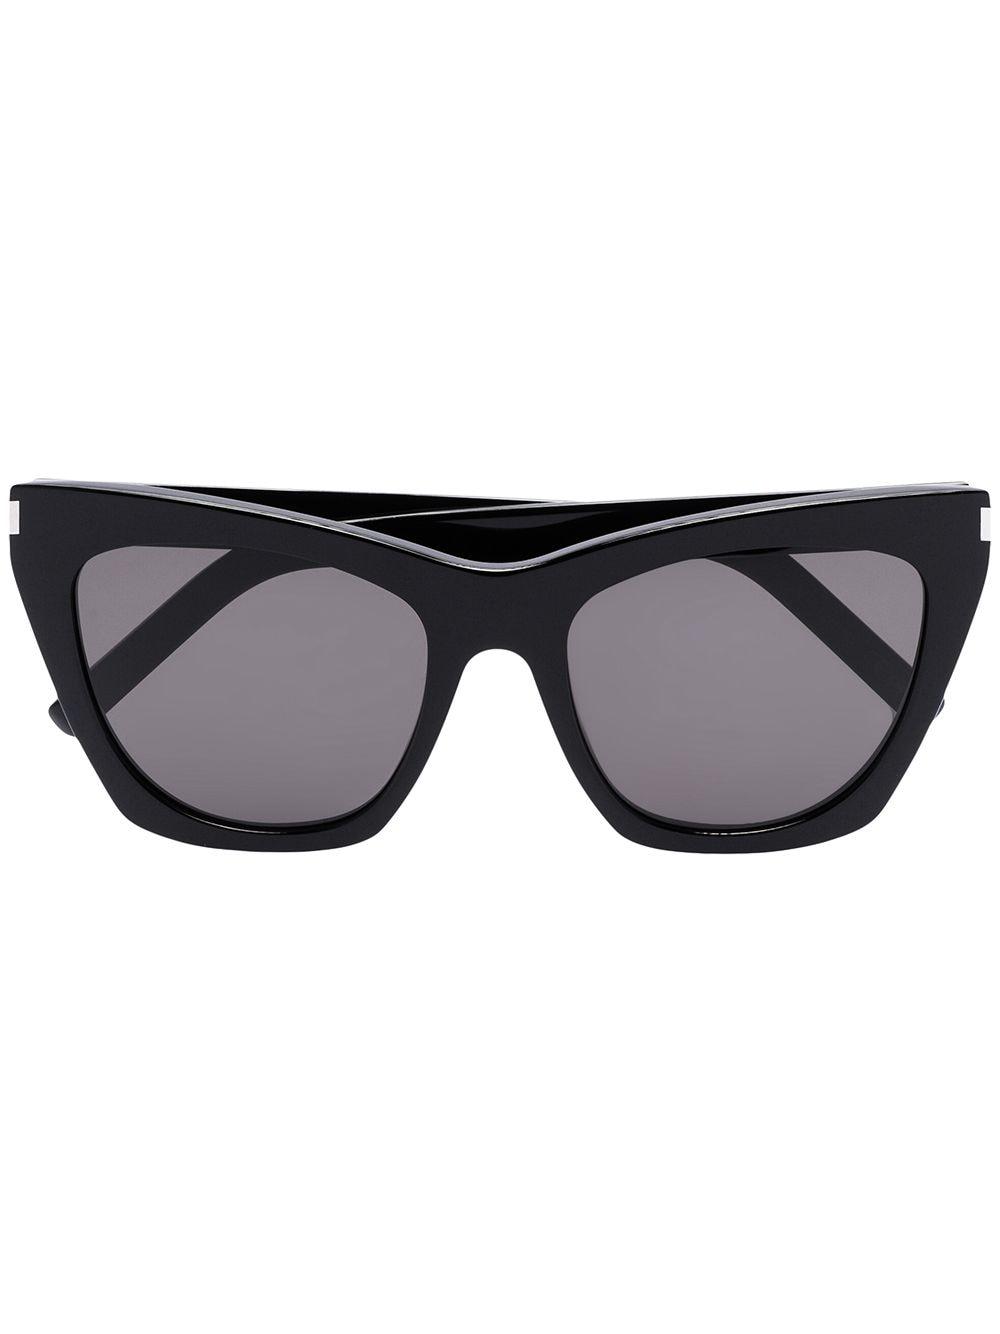 Saint Lauren Eyewear $353.00